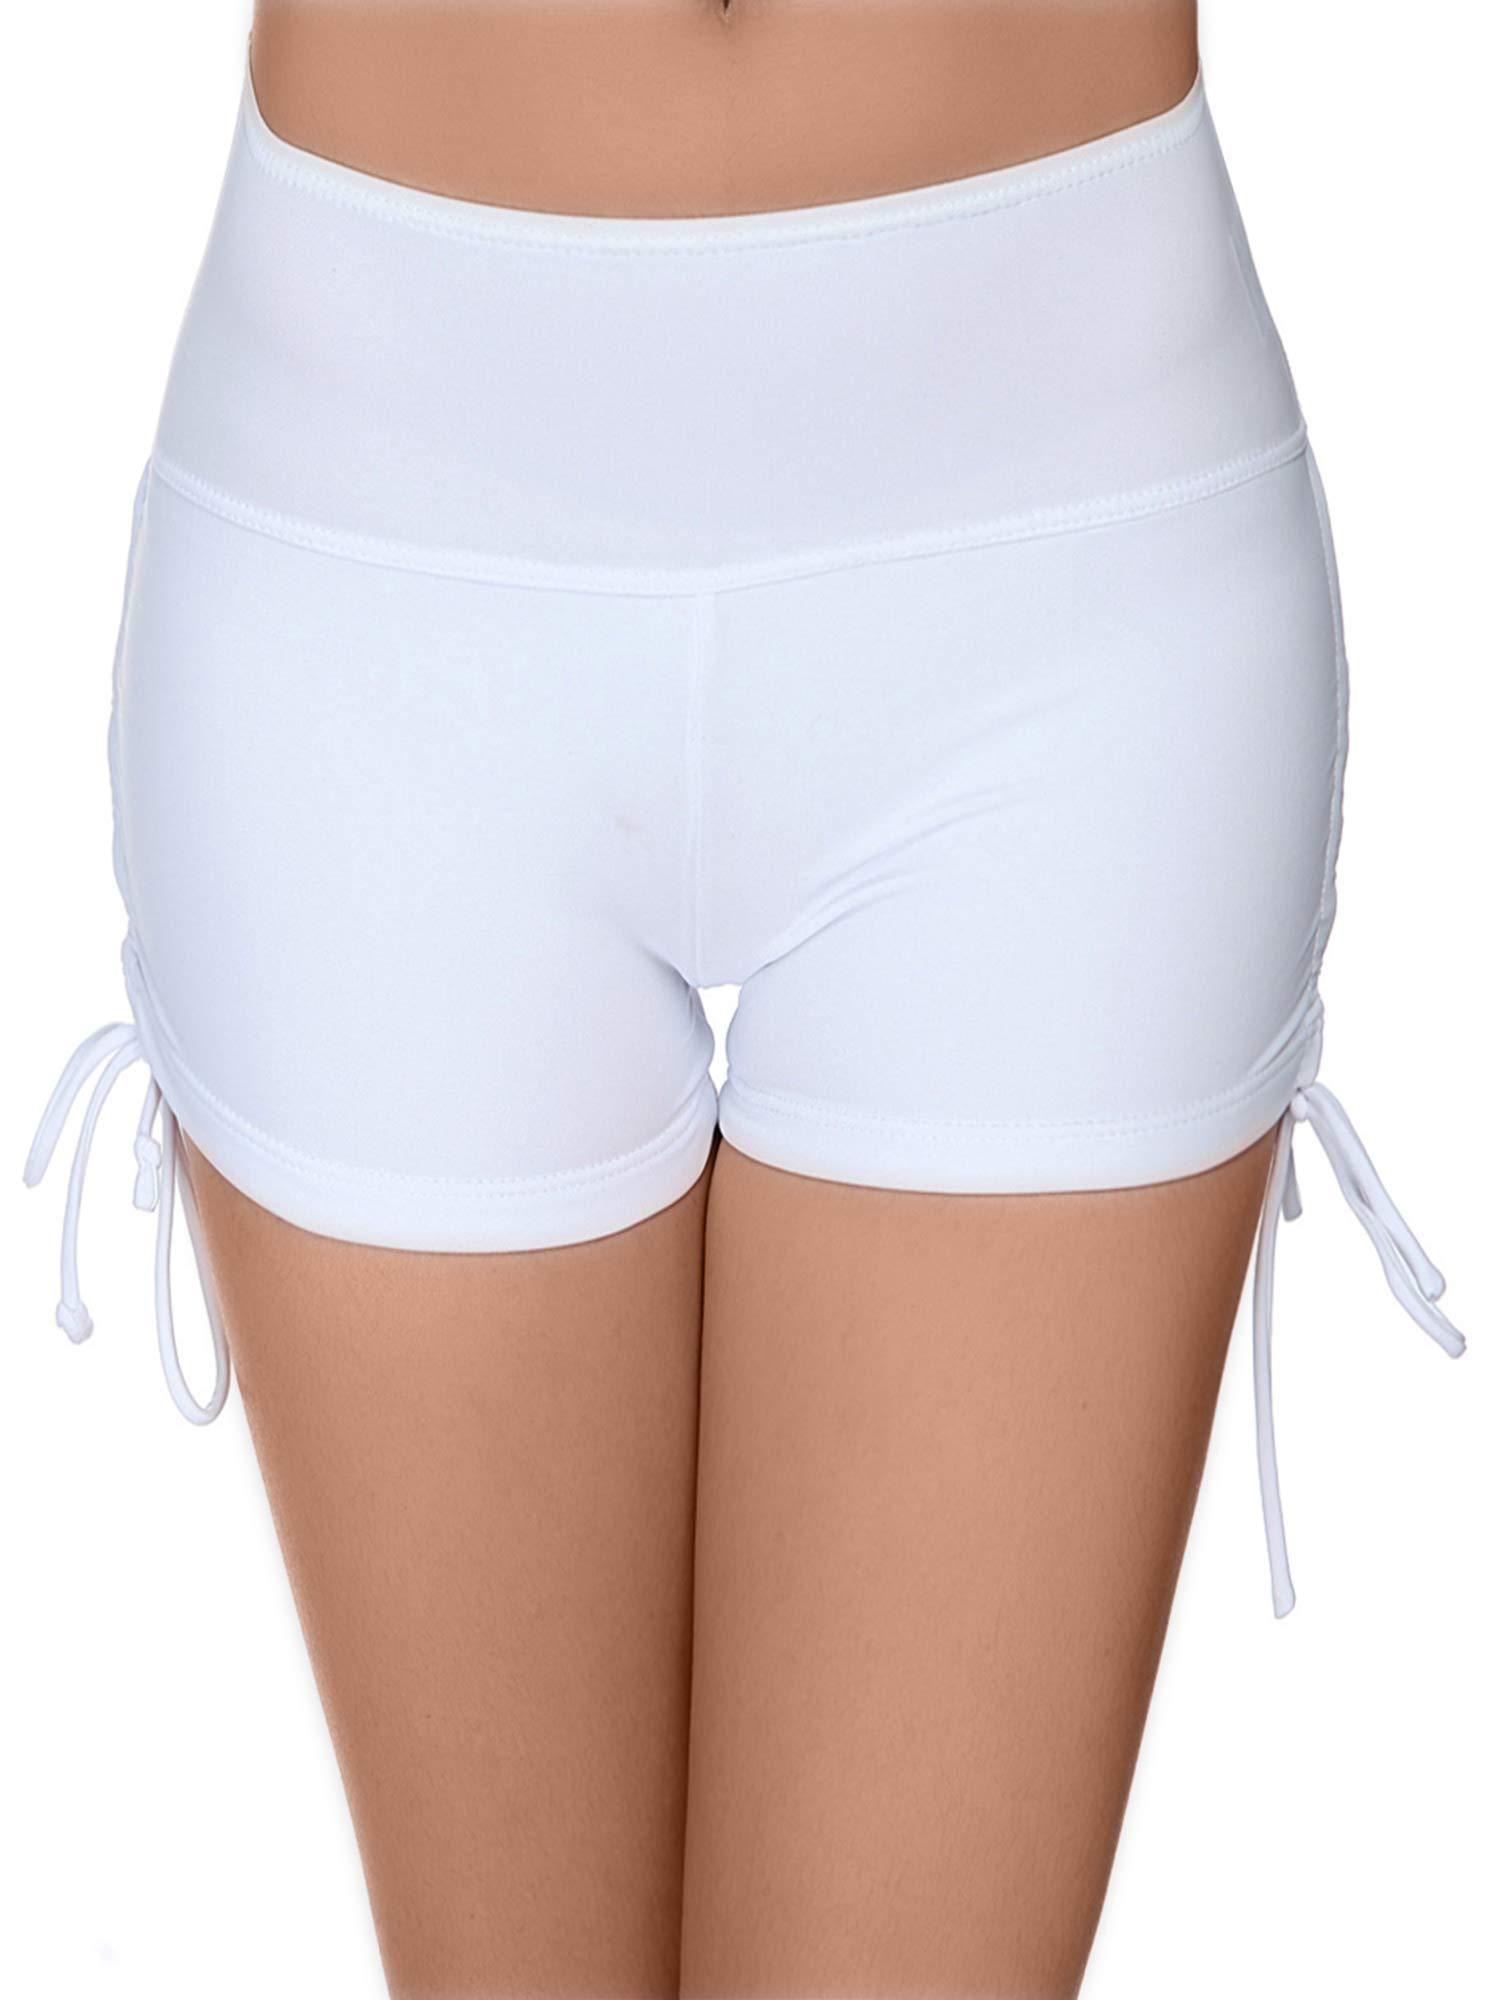 Hestya Women's Swim Shorts Solid Swimsuit Bottoms Quick Dry Swim Board Shorts with Adjustable Ties, Black, S - XXXL (S, White)